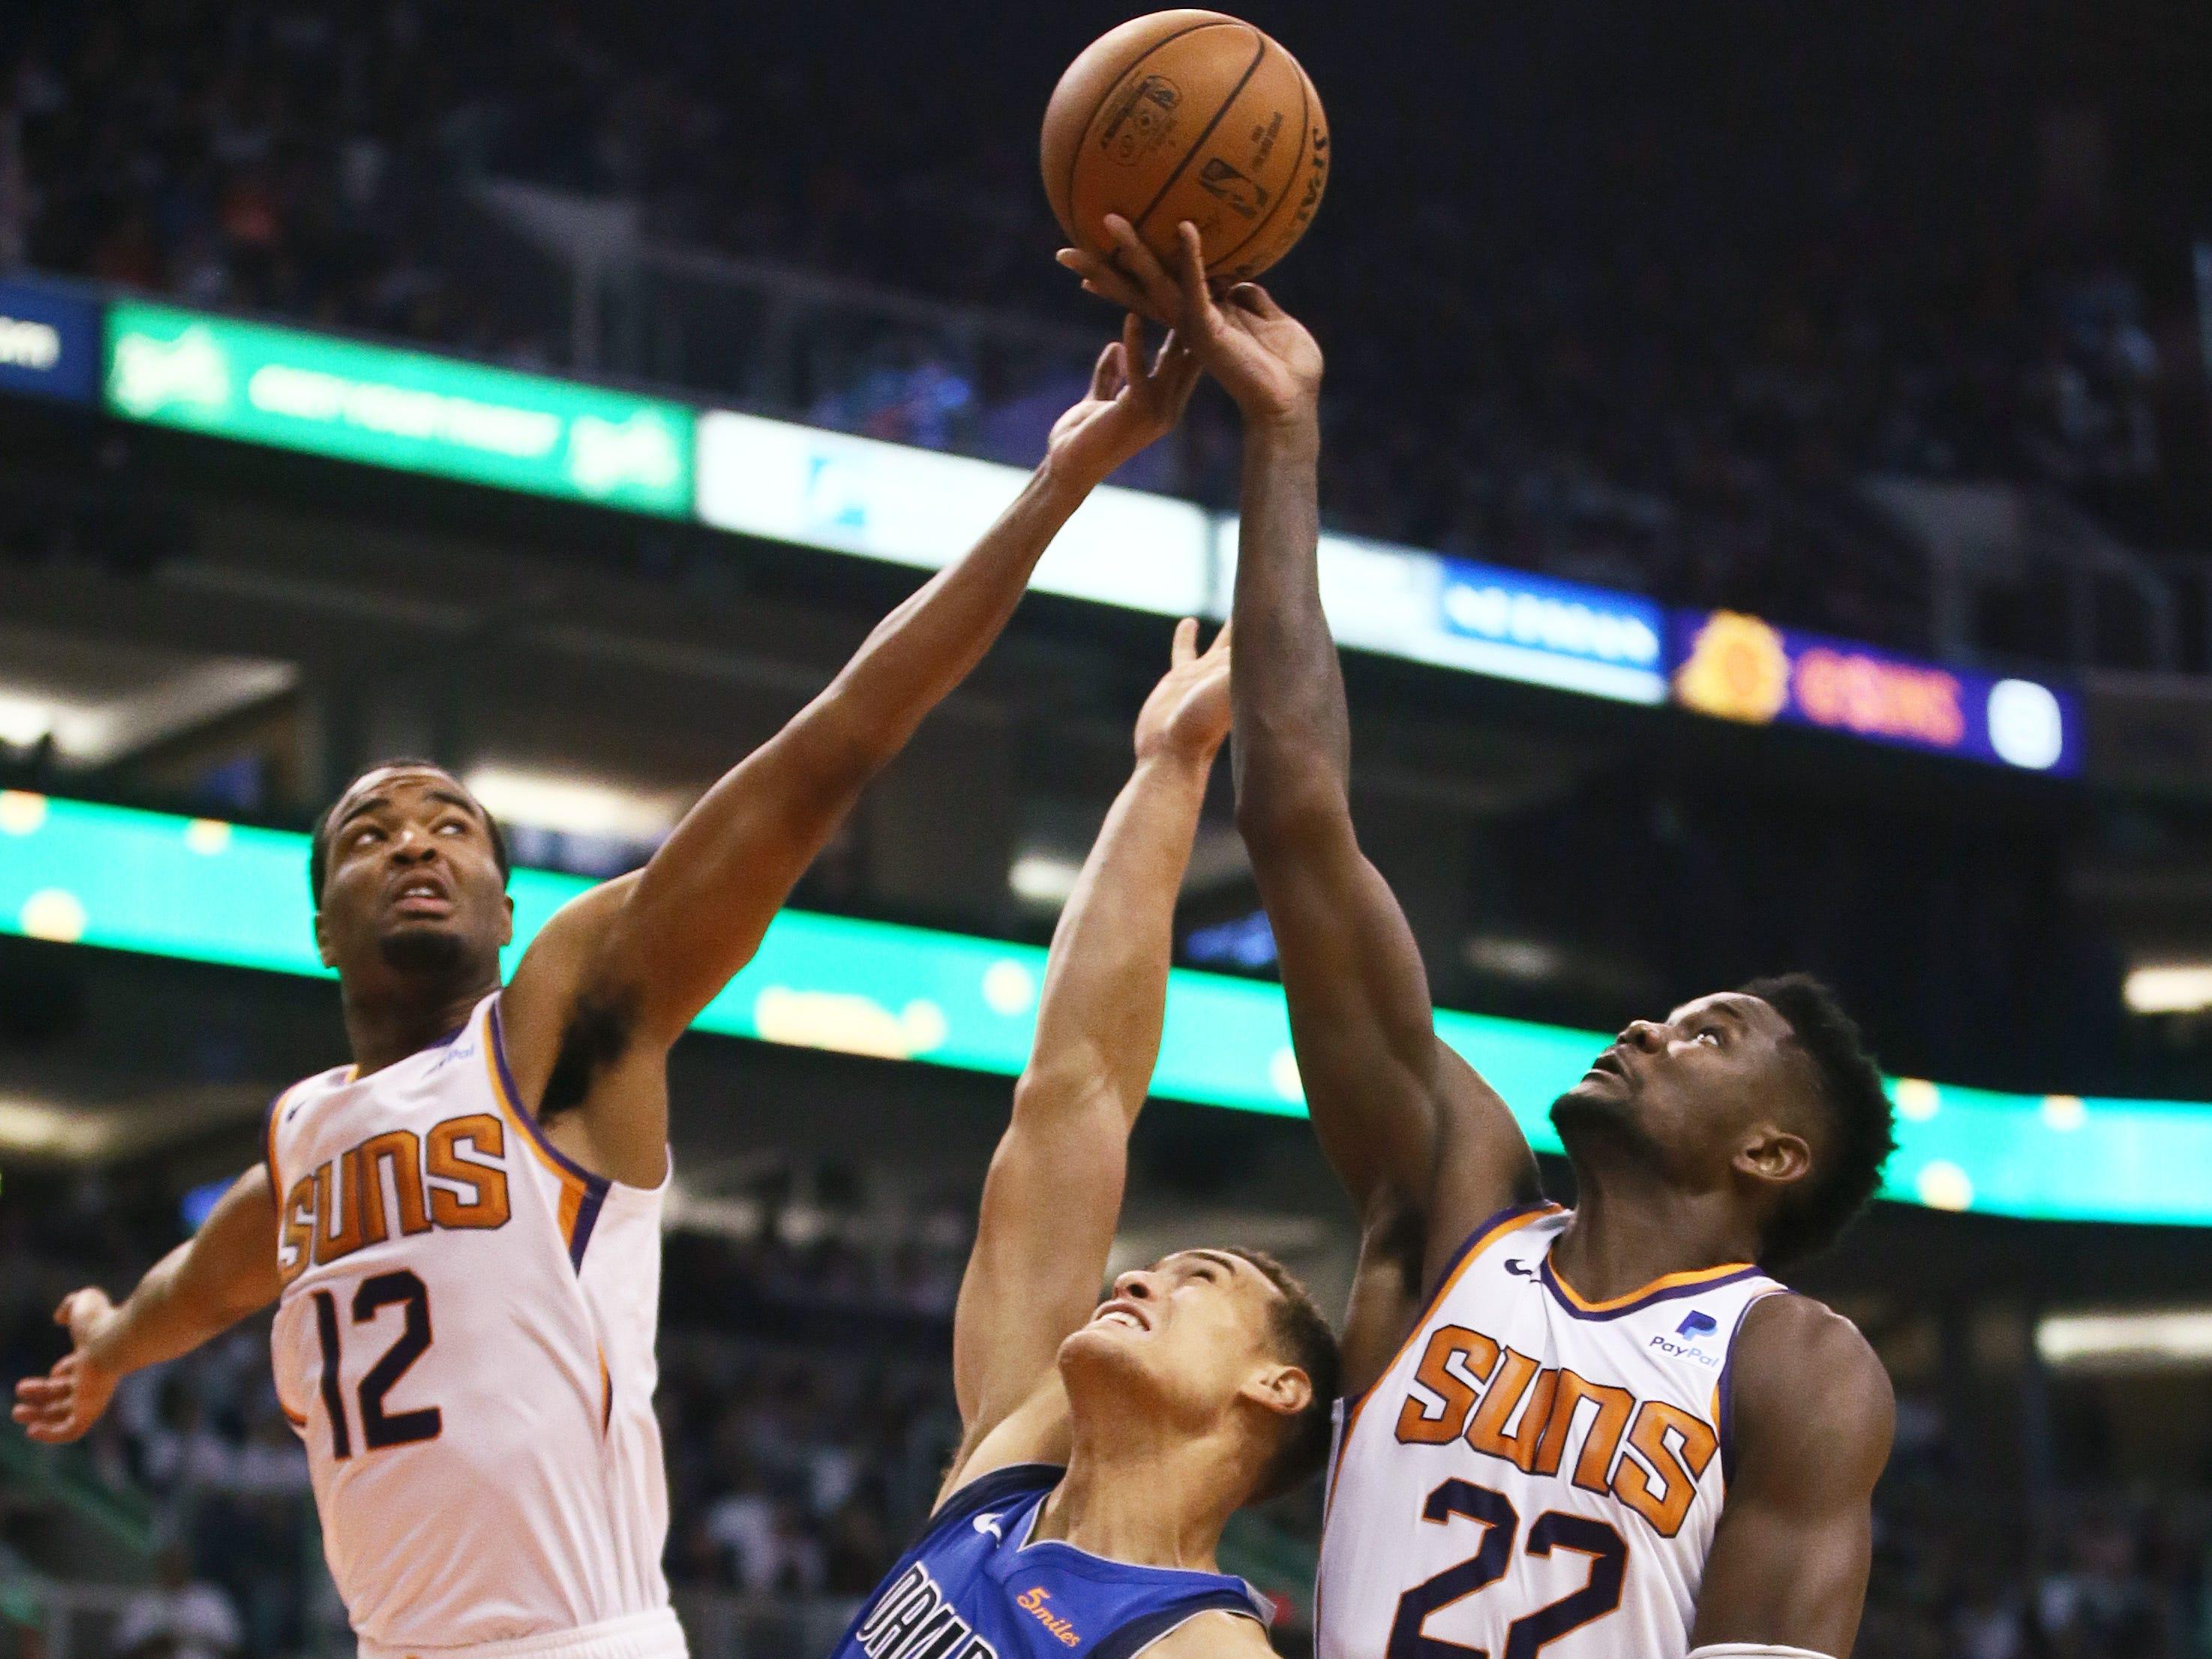 Phoenix Suns rookie center Deandre Ayton reaches for the rebound against Dallas Mavericks Dwight Powell during the season opener at Talking Stick Resort Arena on Oct. 17, 2018, in Phoenix, Ariz.